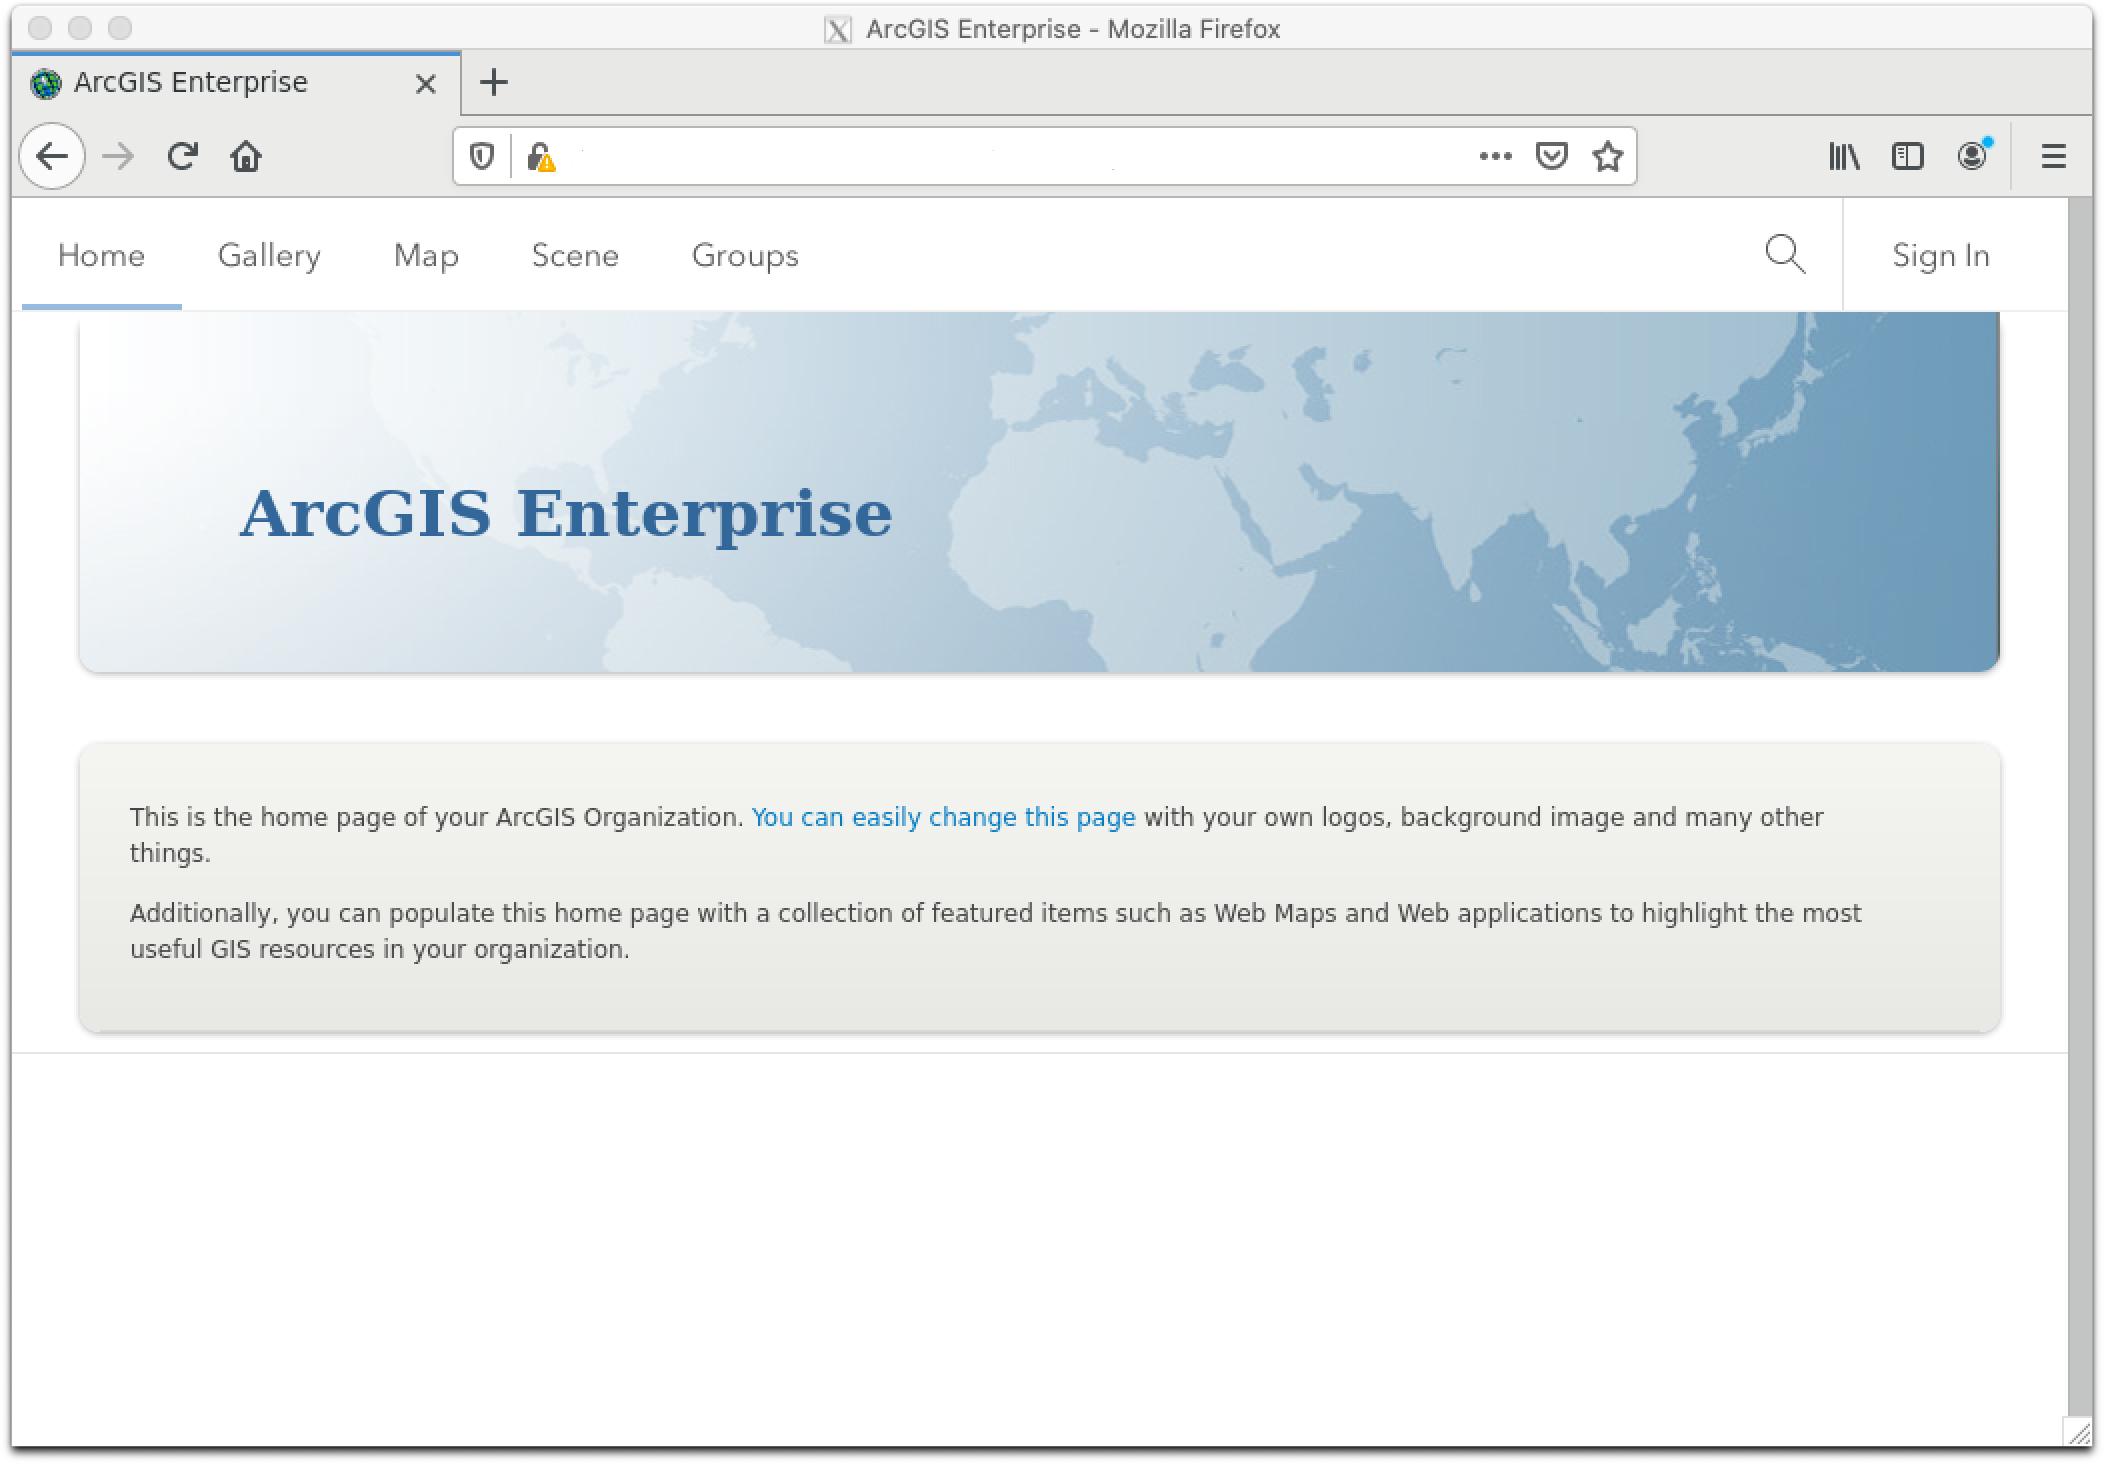 ArcGIS Portal Firefox